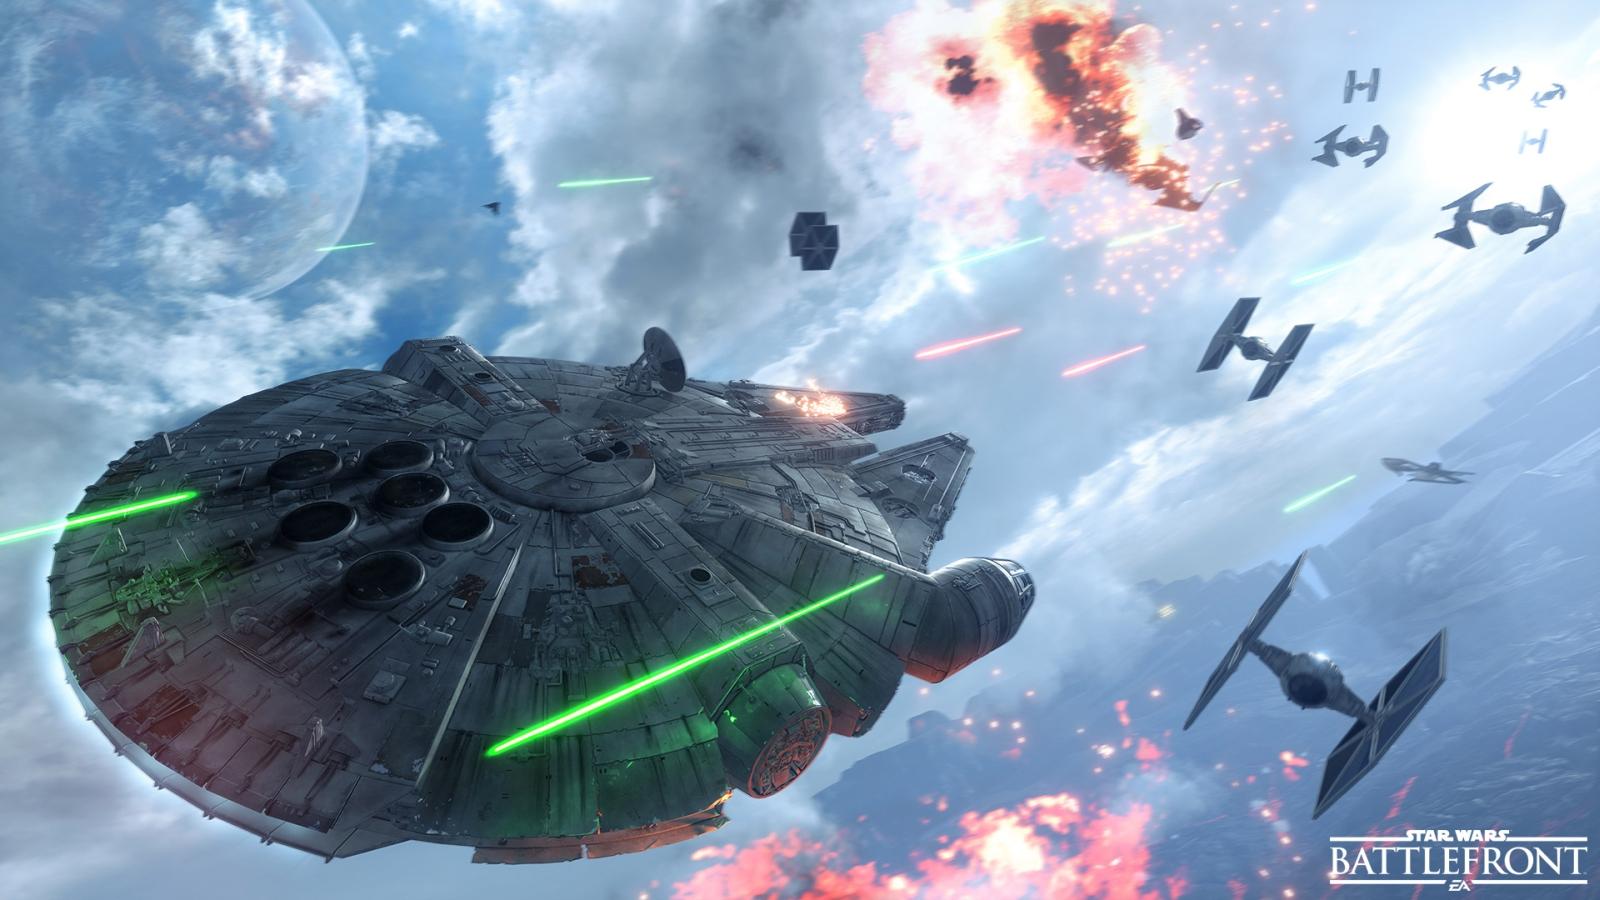 star wars battlefront fight squadron 1